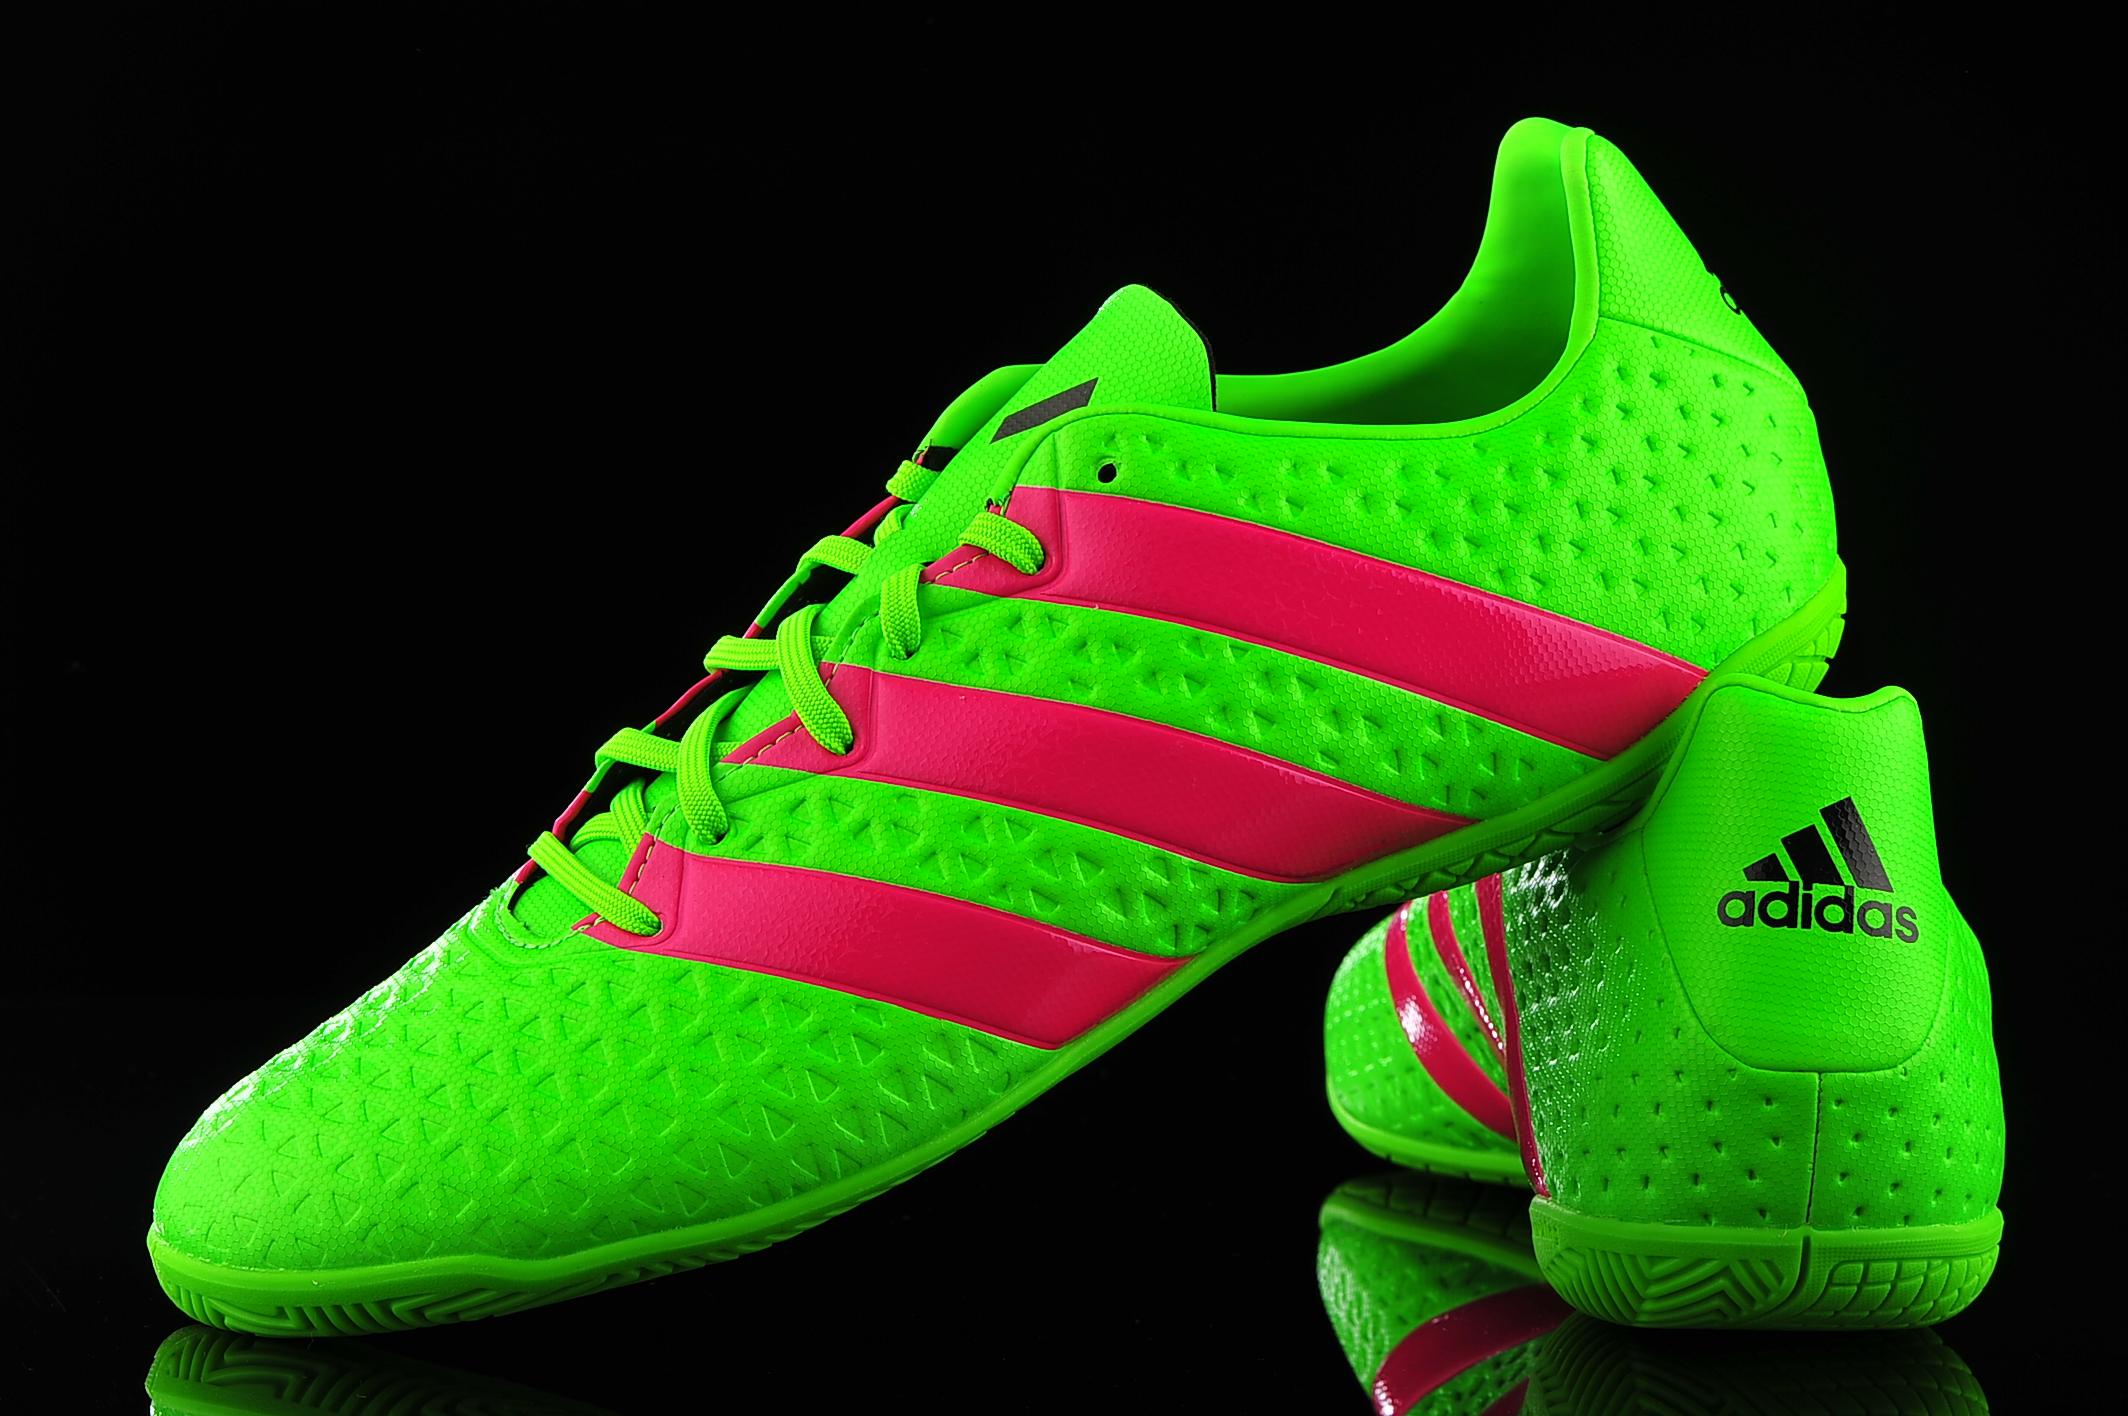 Doctrina Asombrosamente Y equipo  adidas ACE 16.4 IN AF5040 | R-GOL.com - Football boots & equipment